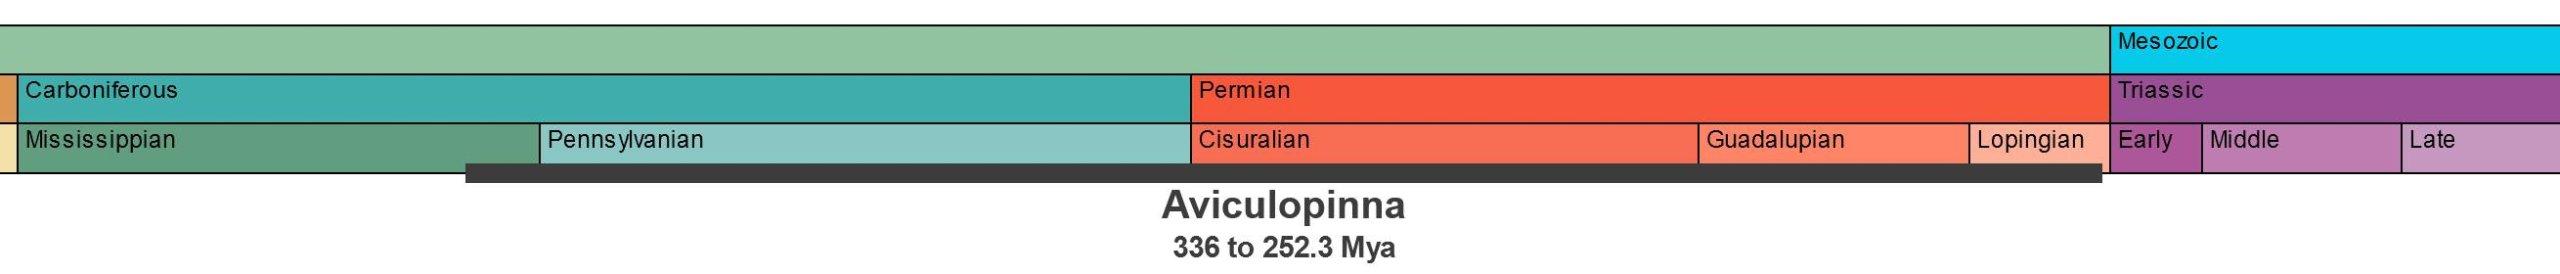 Temporal range of Aviculopinna.